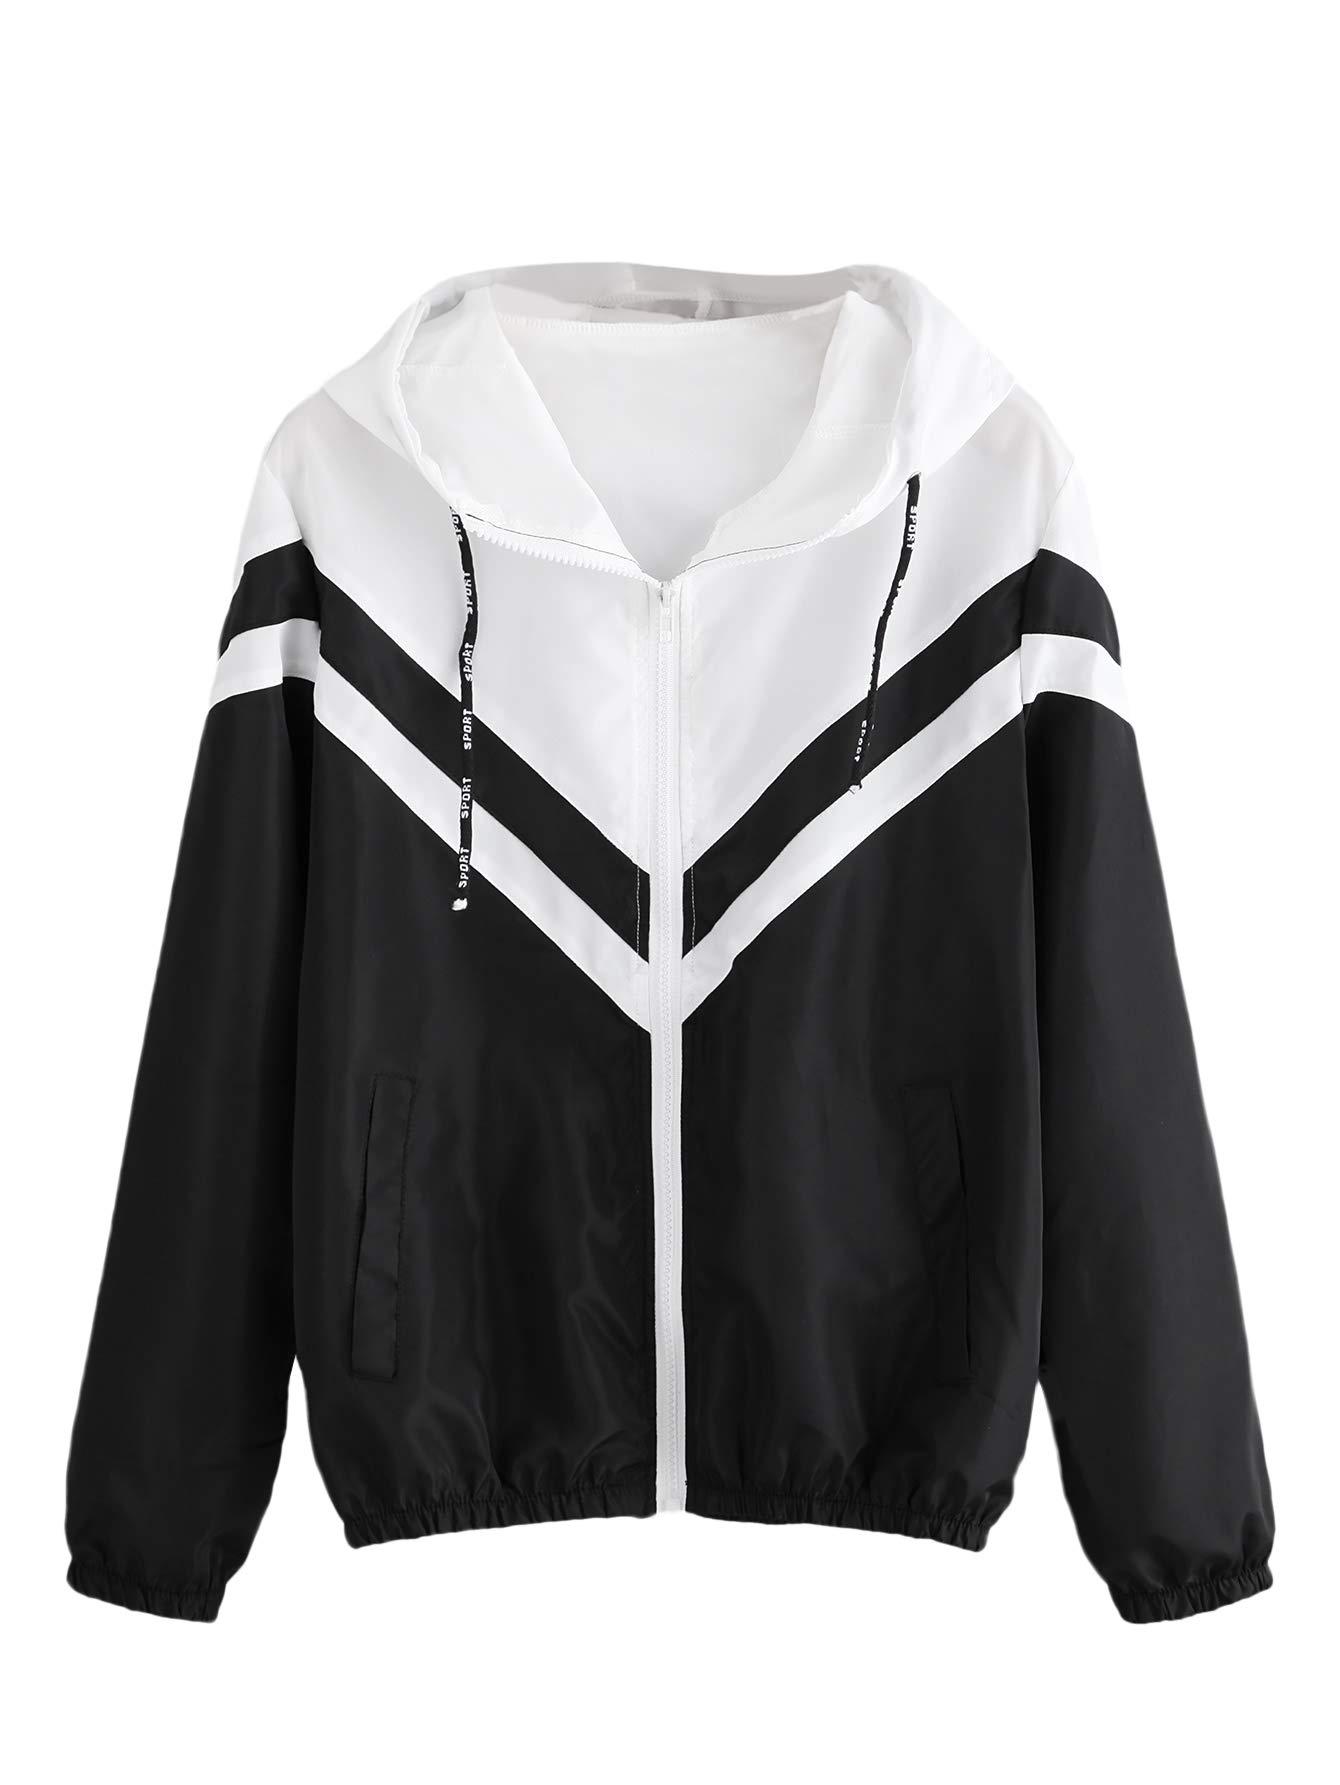 Milumia Women's Color Block Drawstring Hooded Zip Up Sports Jacket Windproof Windbreaker Largel Black-2